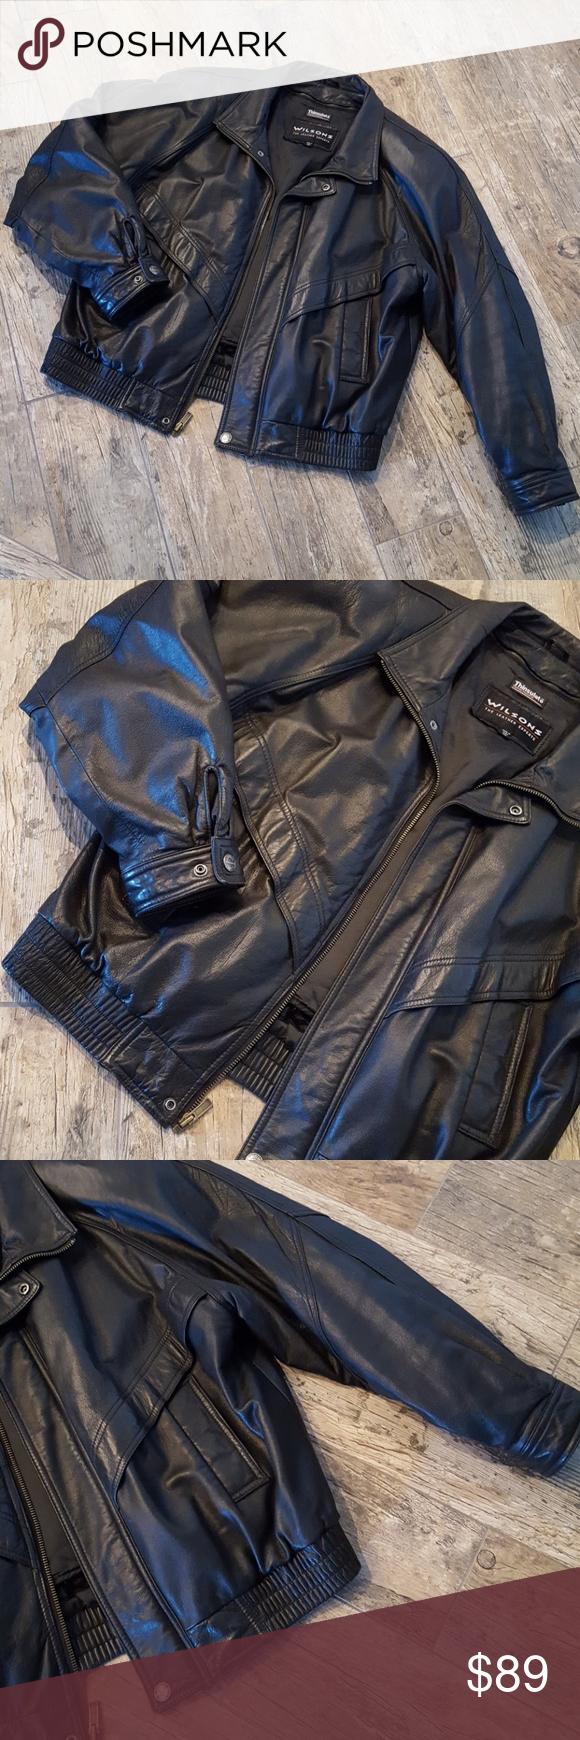 Wilsons Leather jacket szXL Wilsons leather jacket